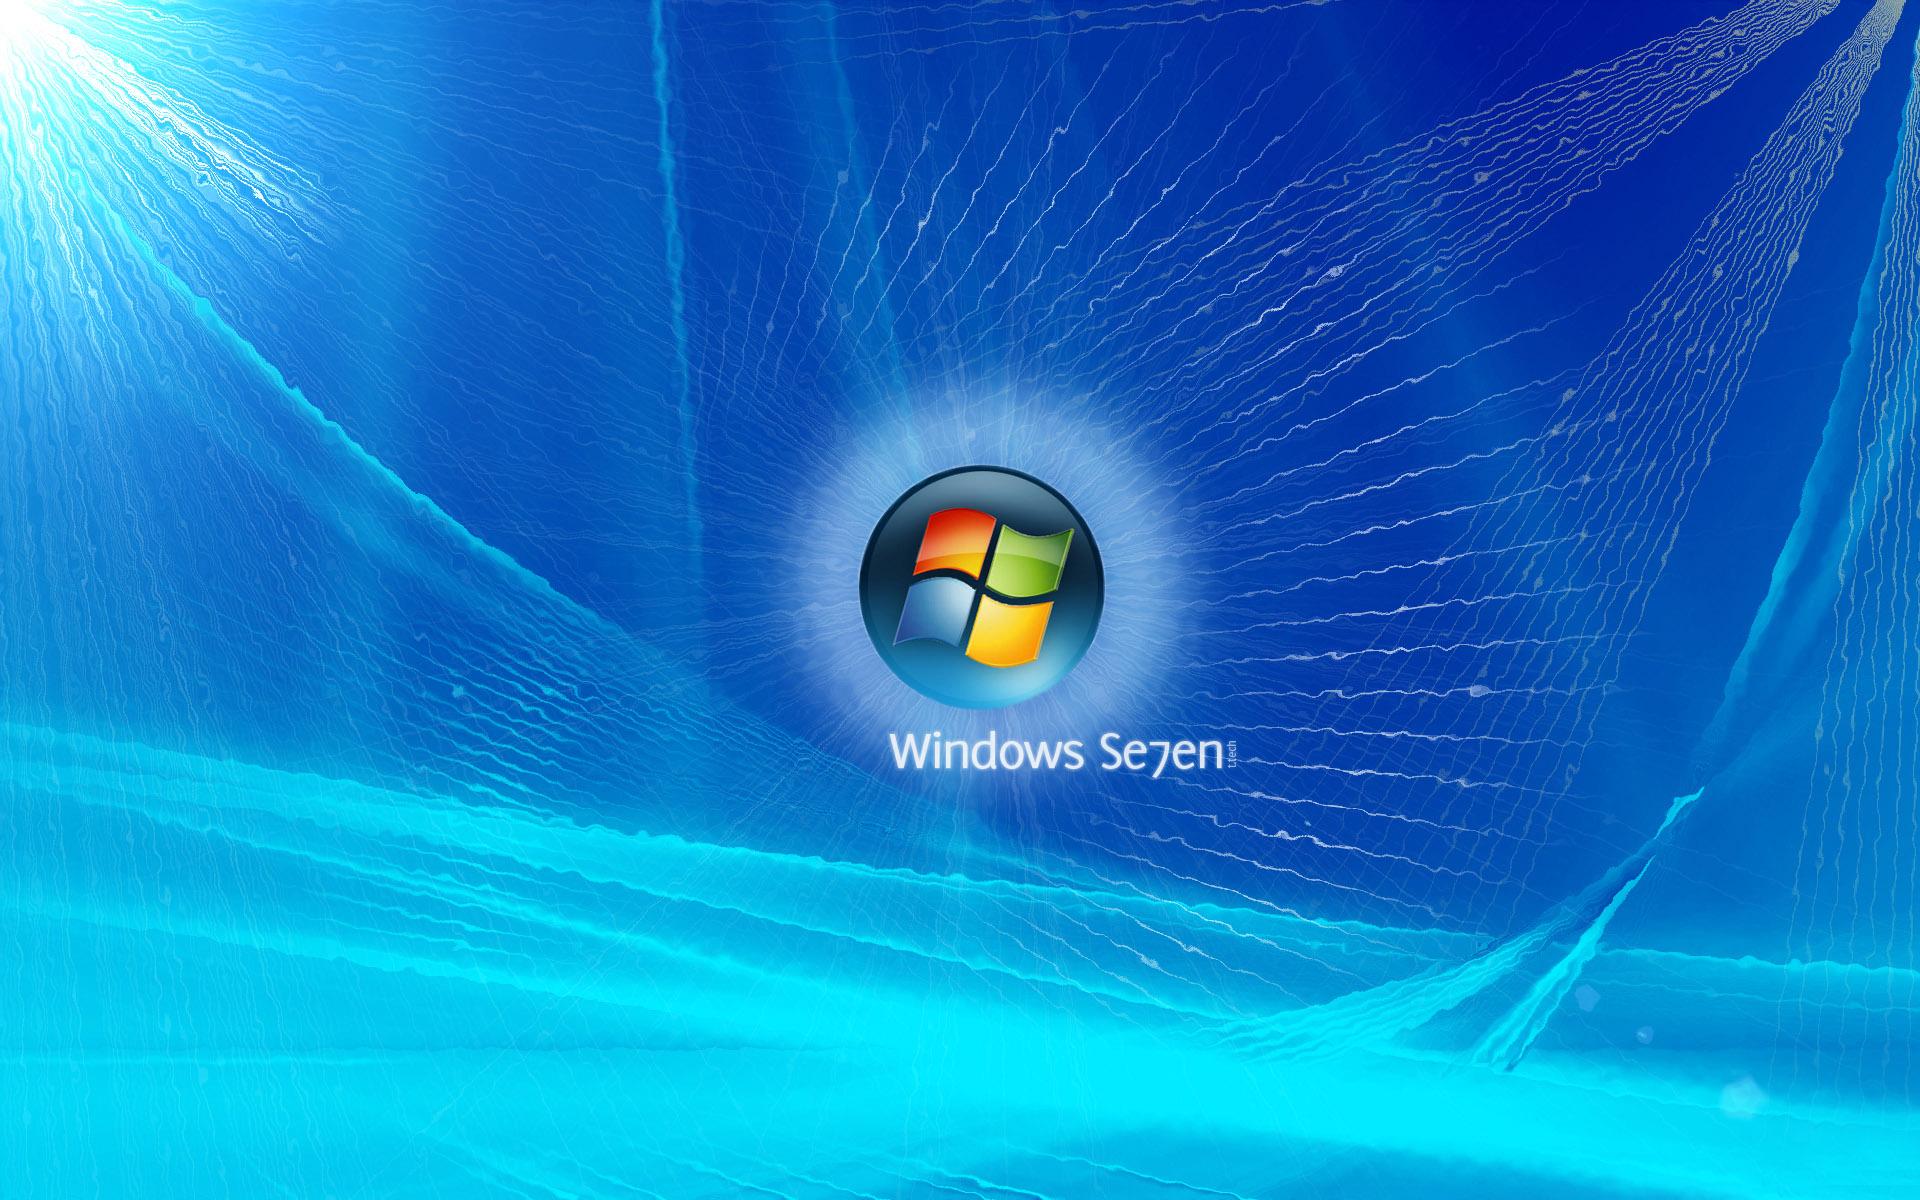 Windows Se7en Wallpaper Set 22 Awesome Wallpapers 1920x1200